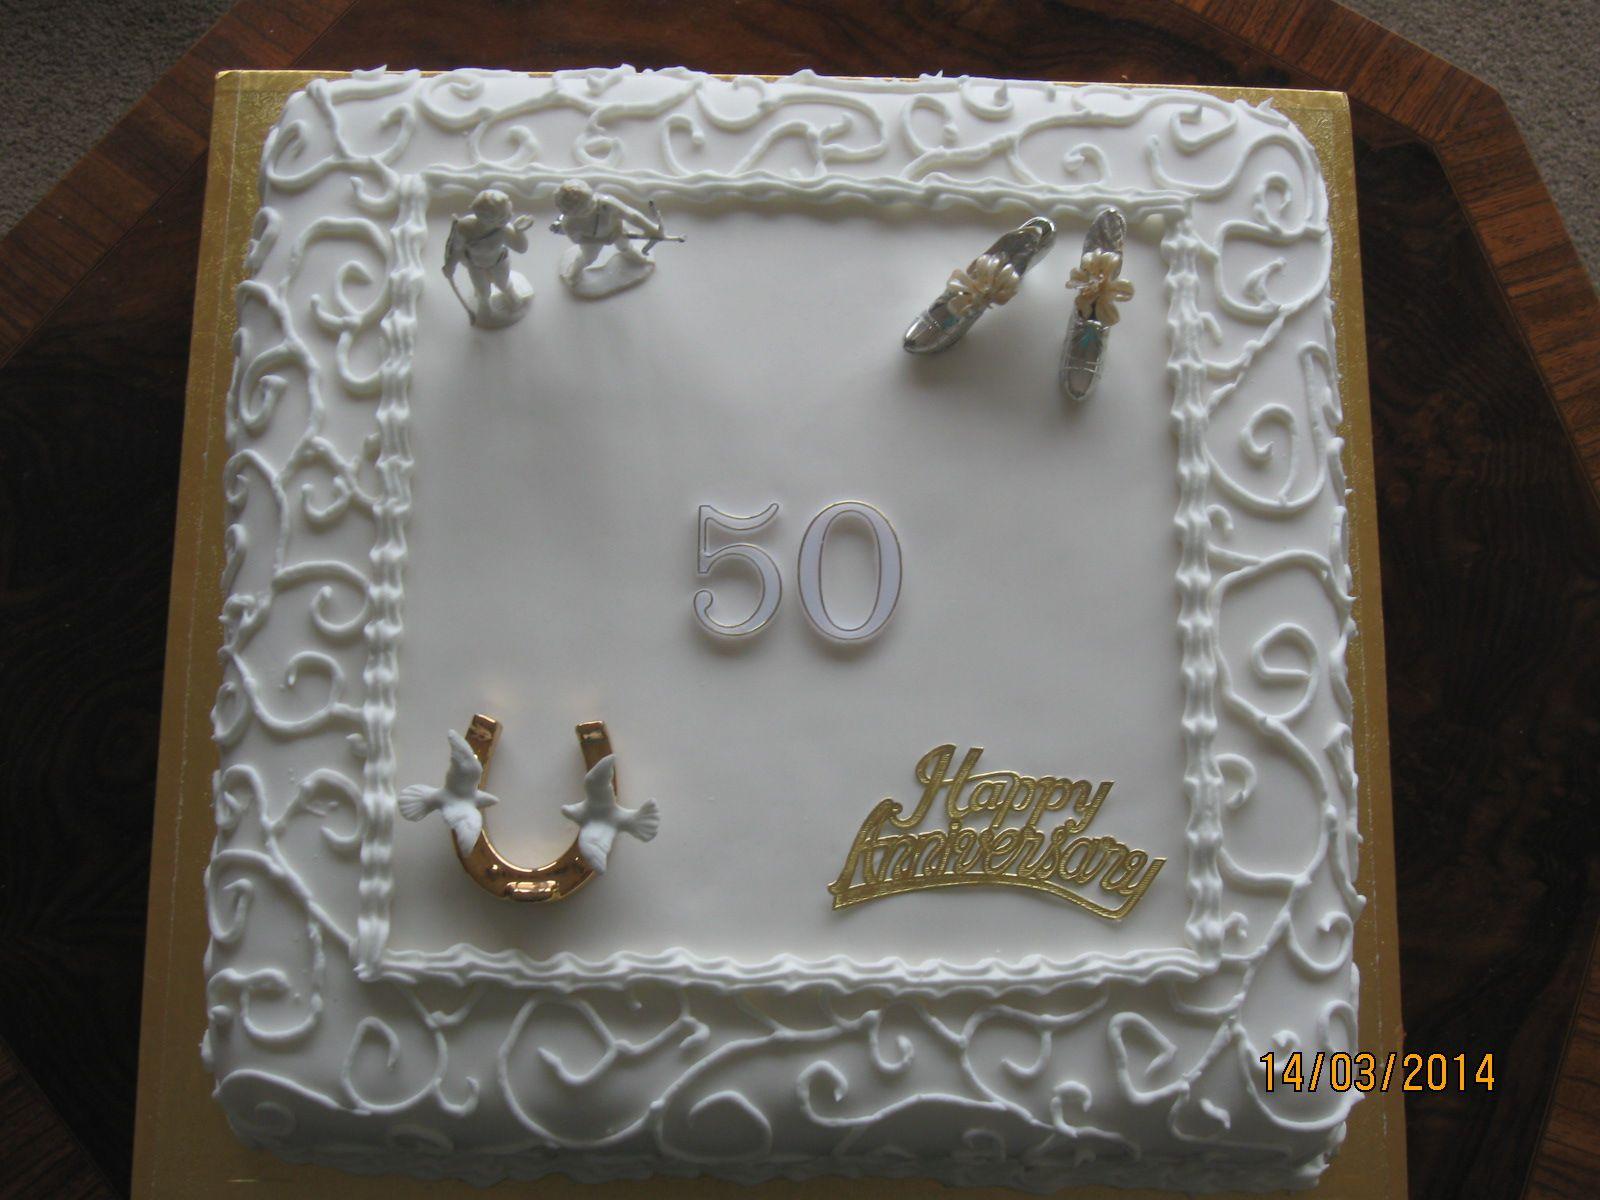 Th wedding anniversary cake using some decrations off the original